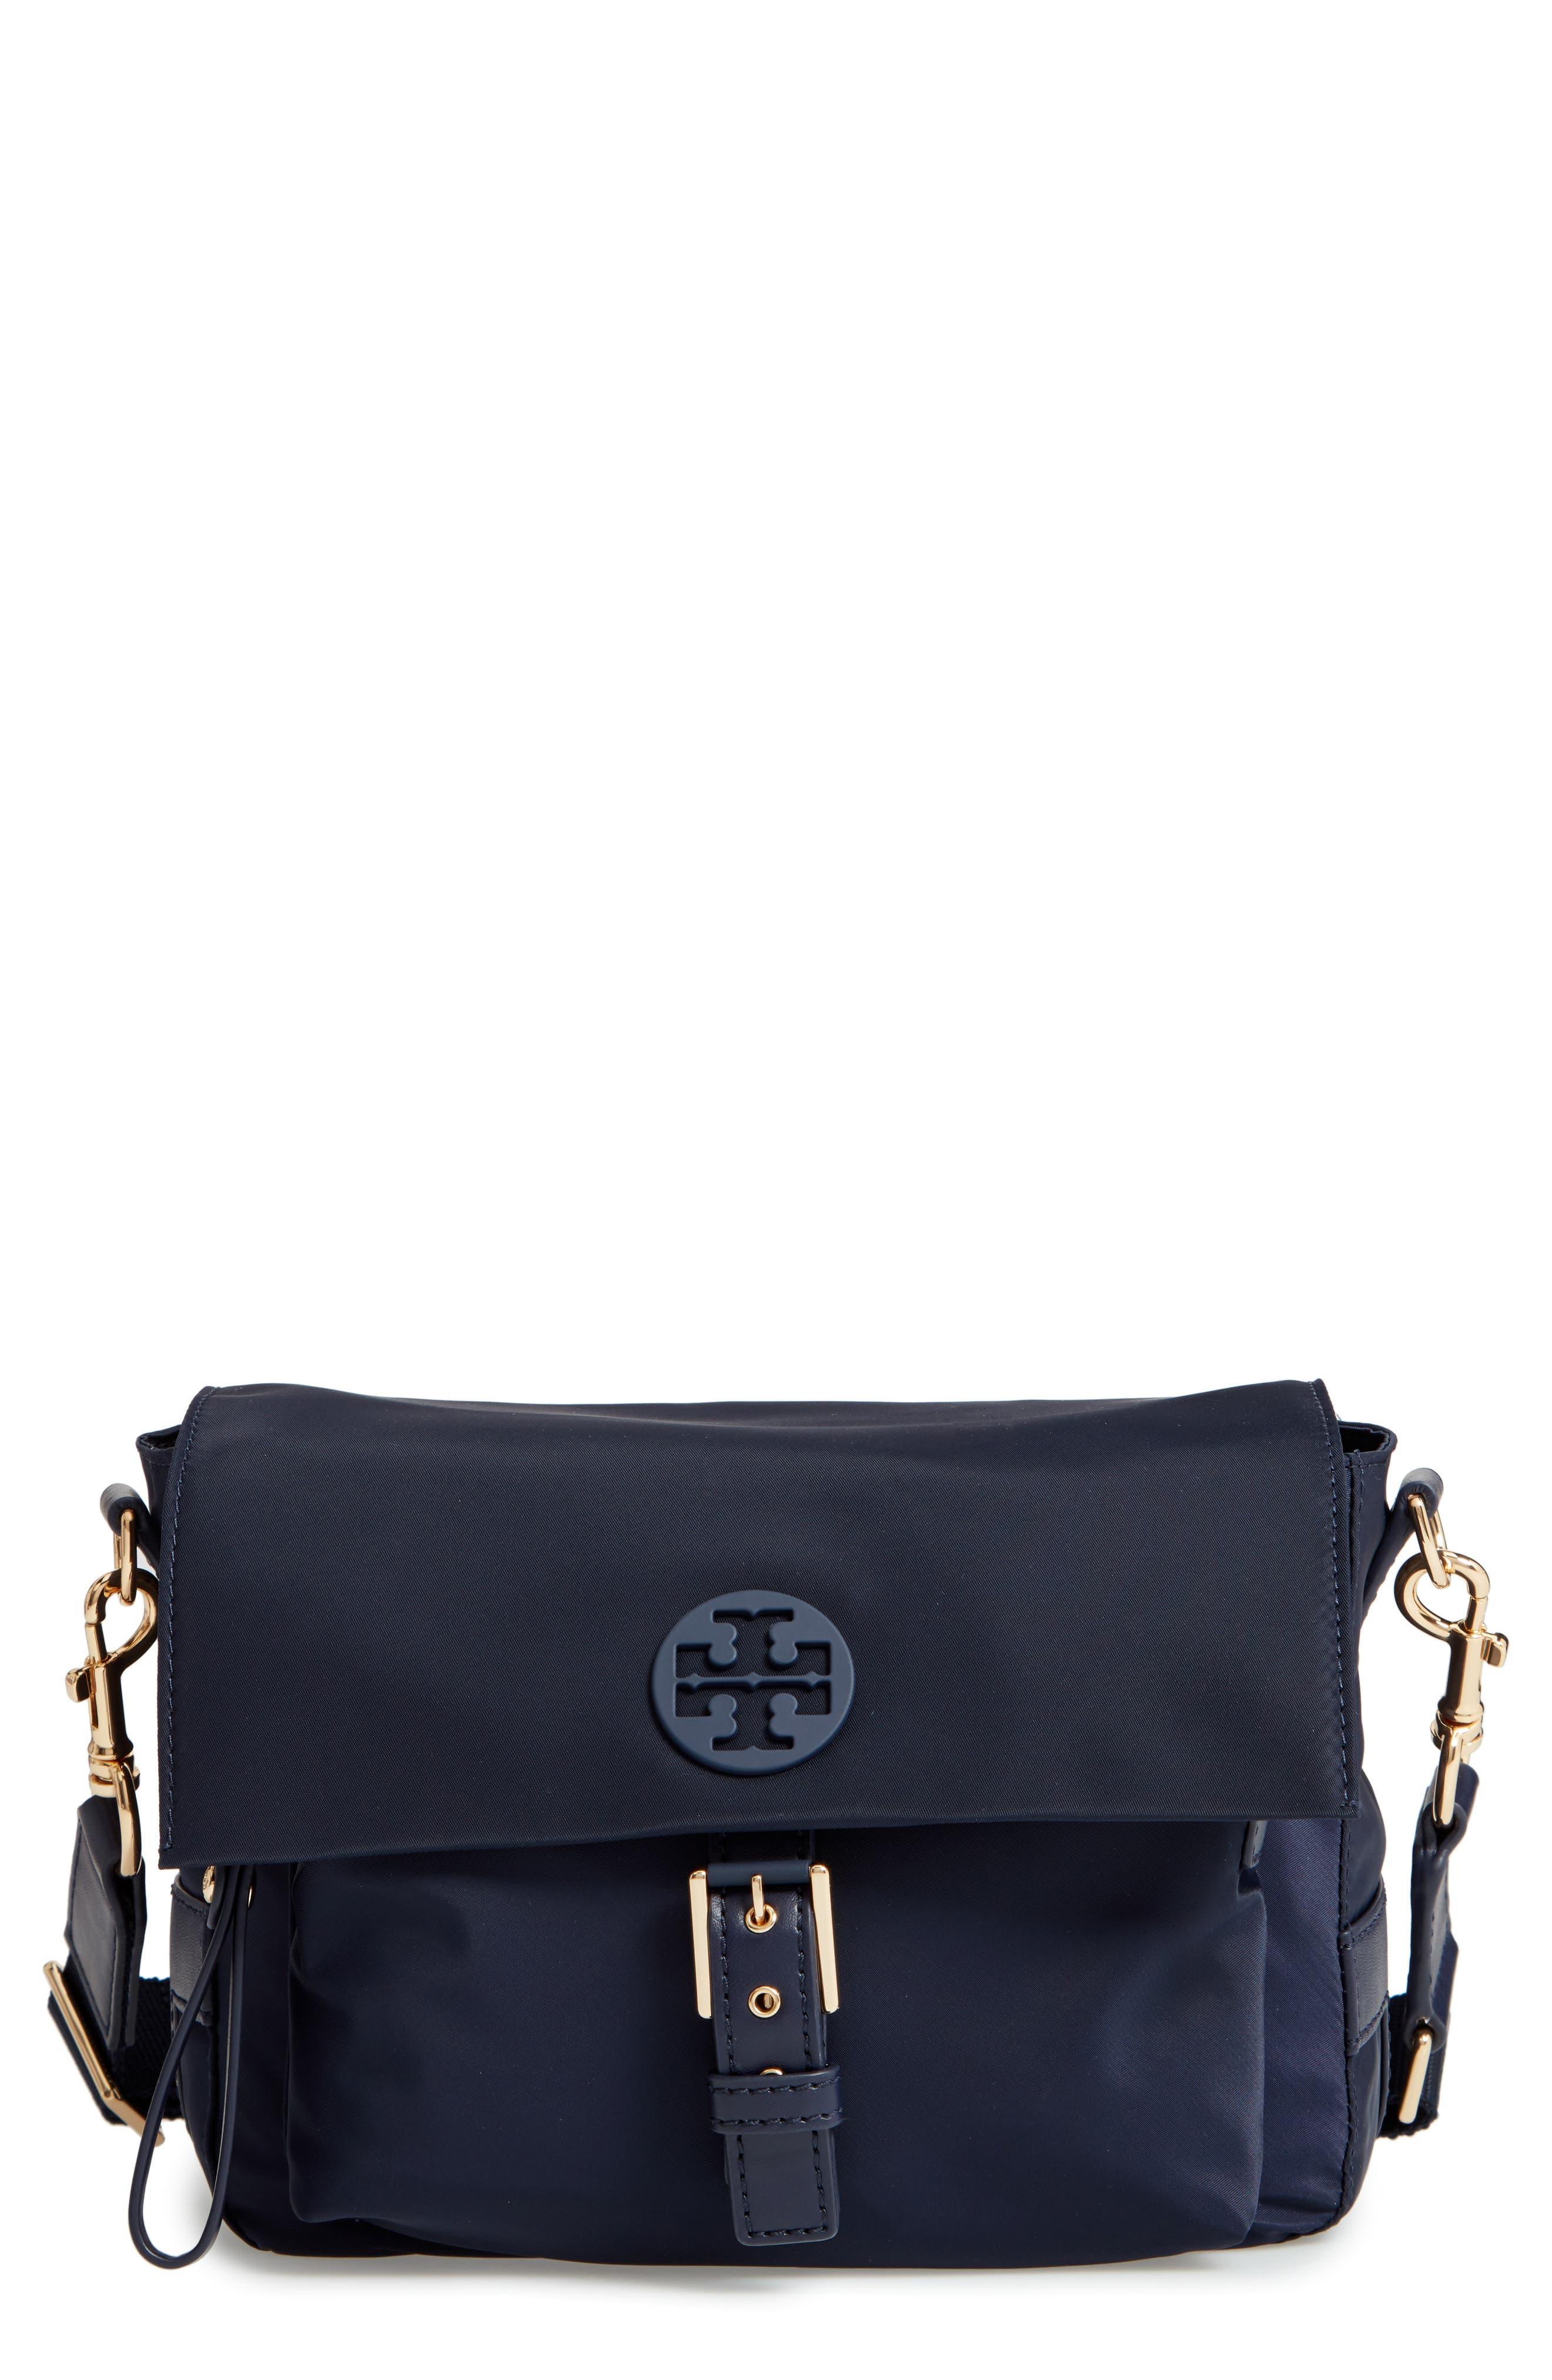 Tilda Nylon Crossbody Bag,                             Main thumbnail 1, color,                             400